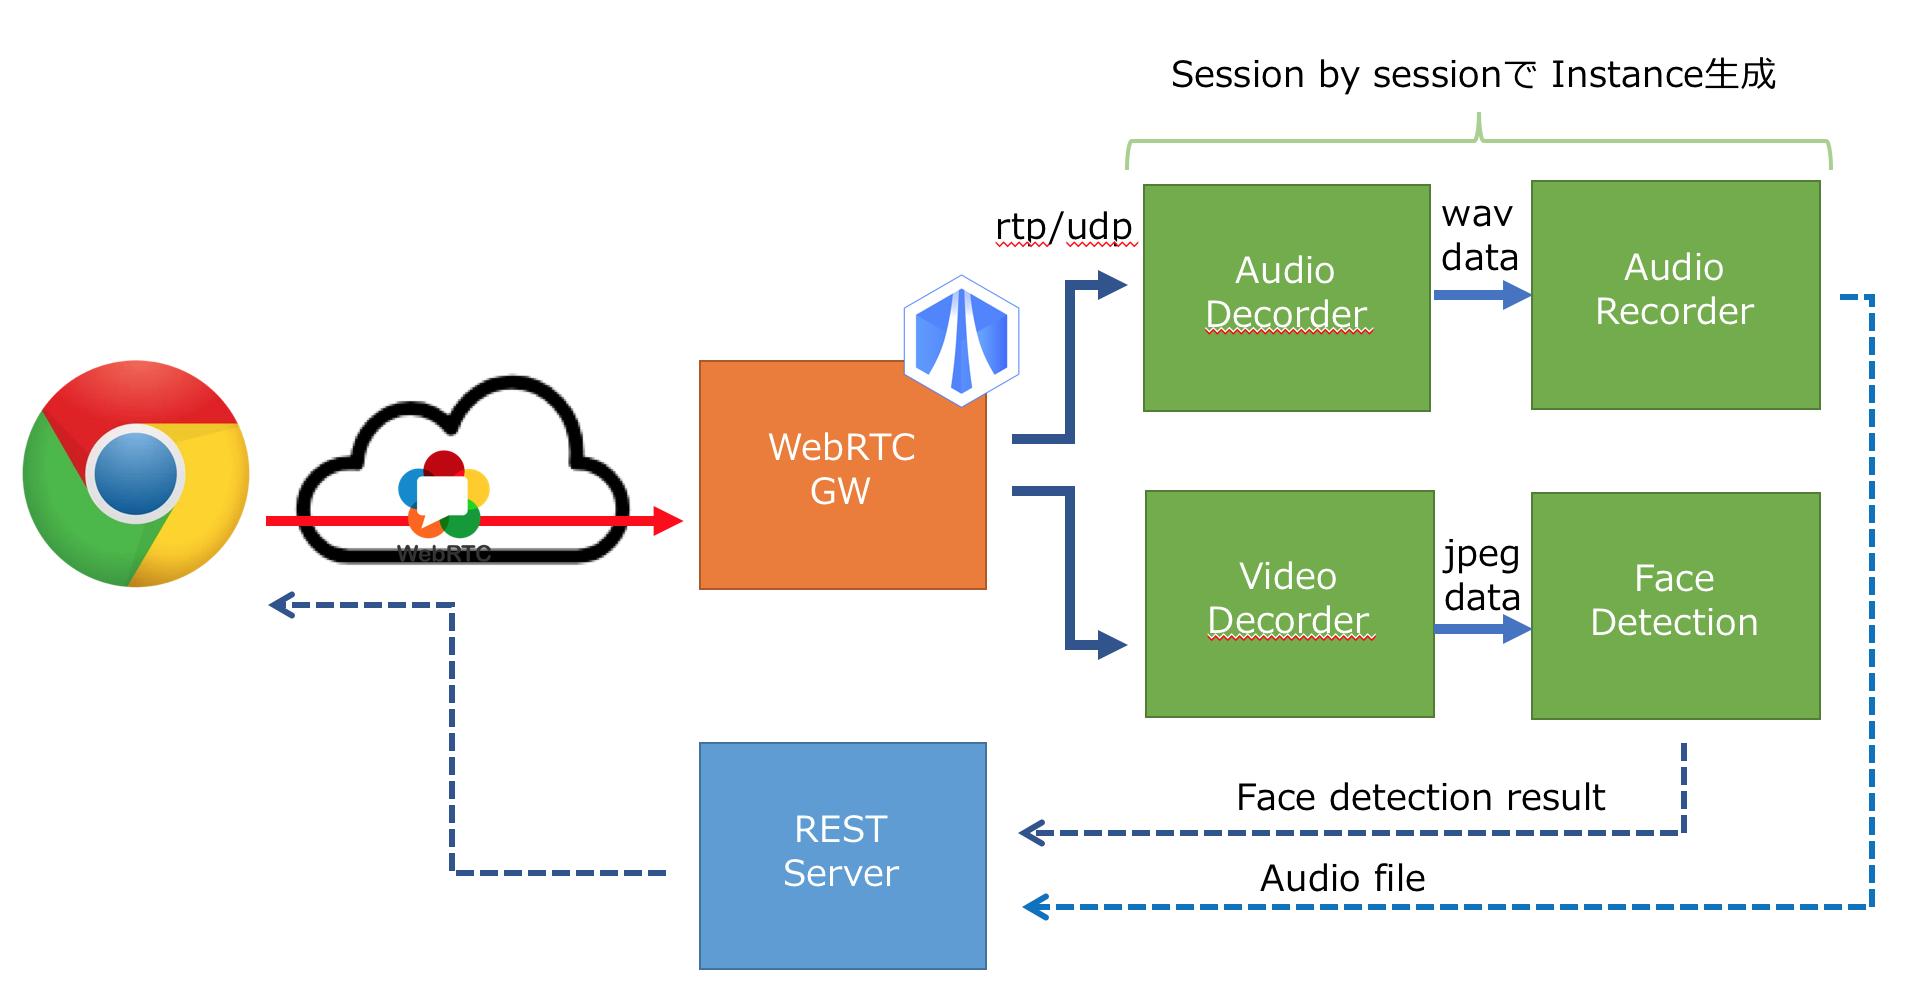 SkyWay WebRTC GWとOpenCVなんかを組み合わせて顔検出とかやって